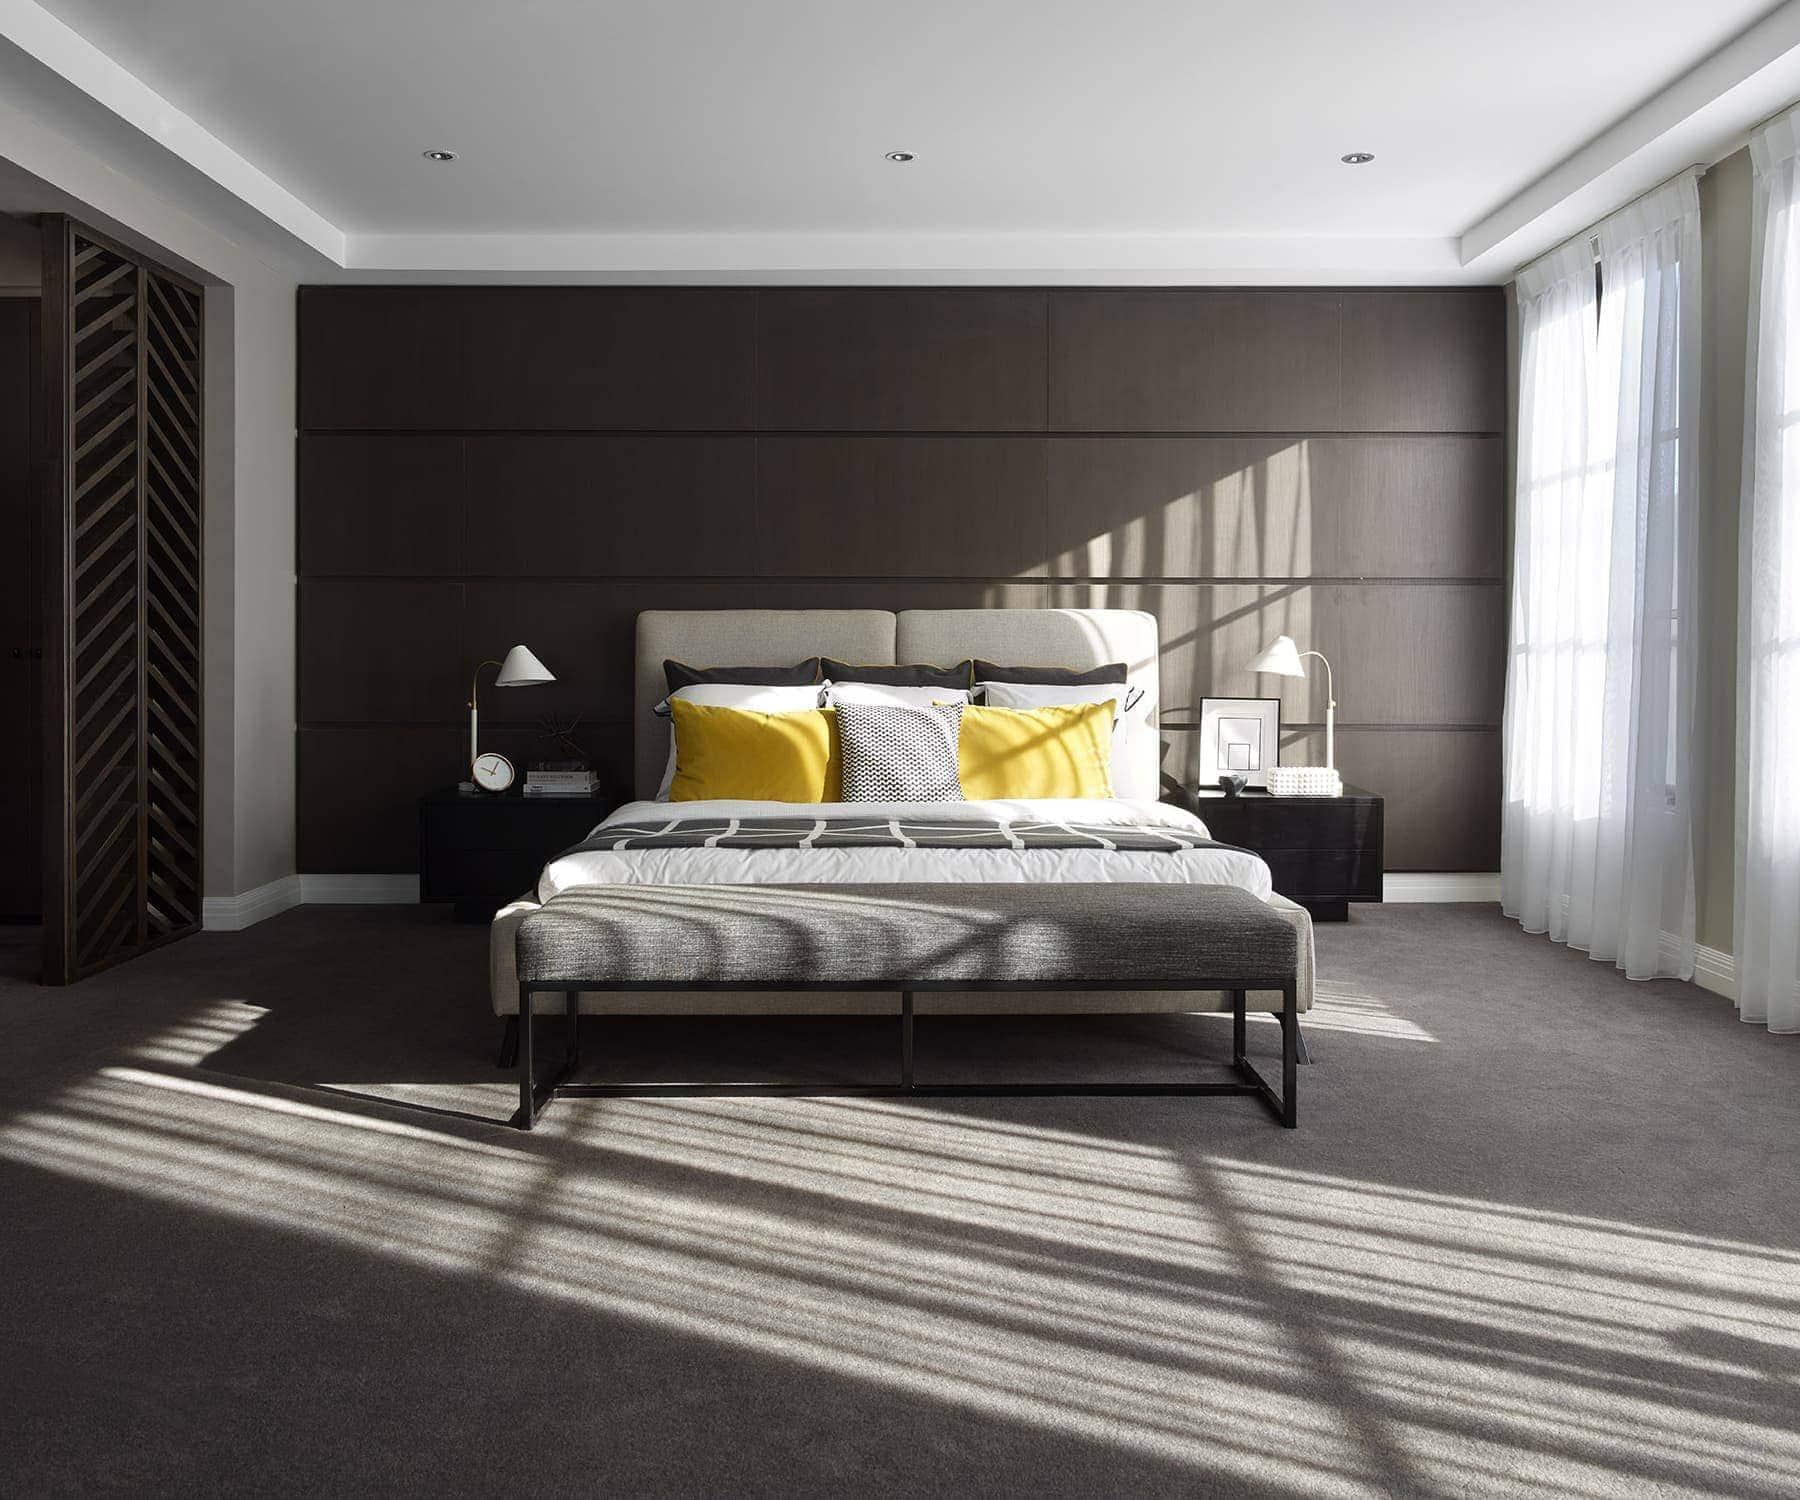 6 Dark Bedroom Wall Ideas To Embrace Tlc Interiors